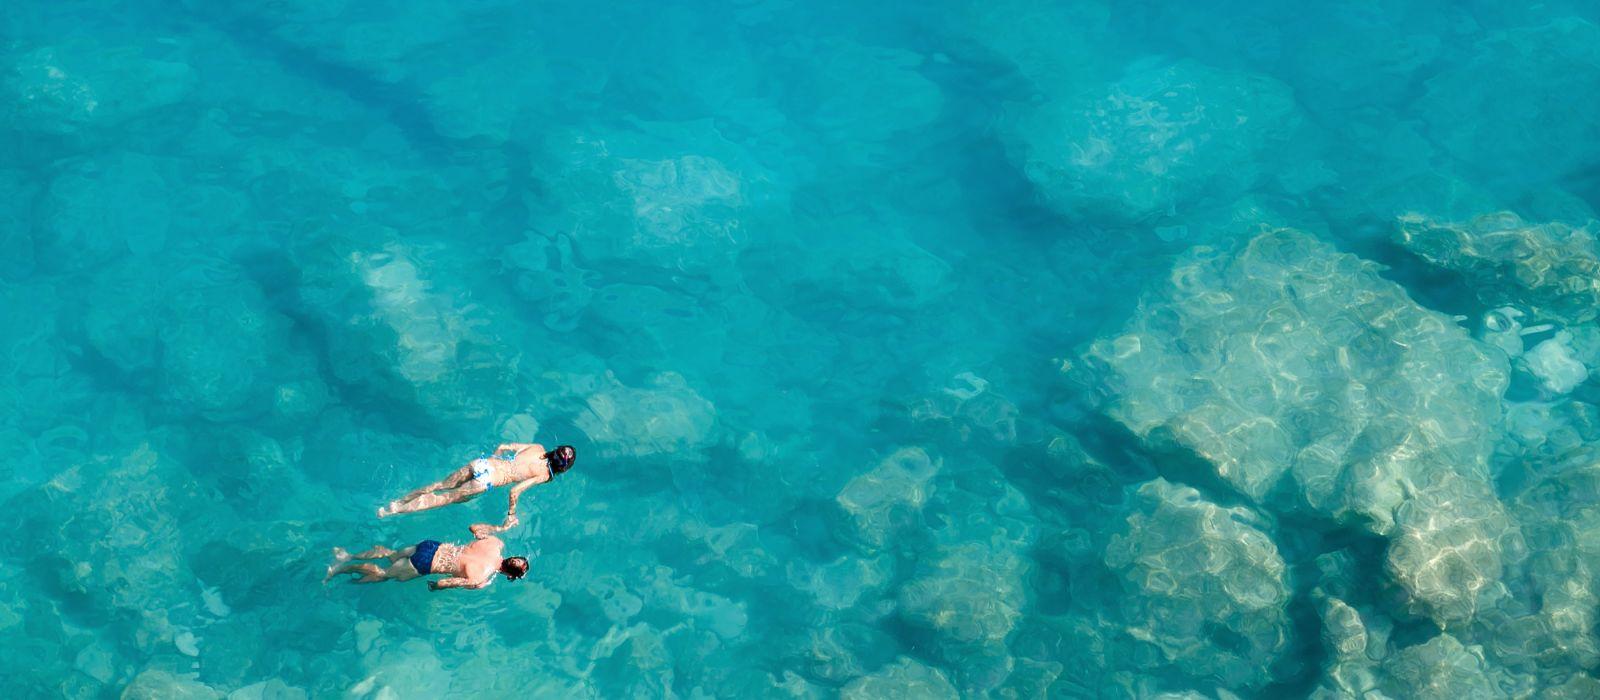 Couple snorkeling, Maldives, Asia - history of Maldives